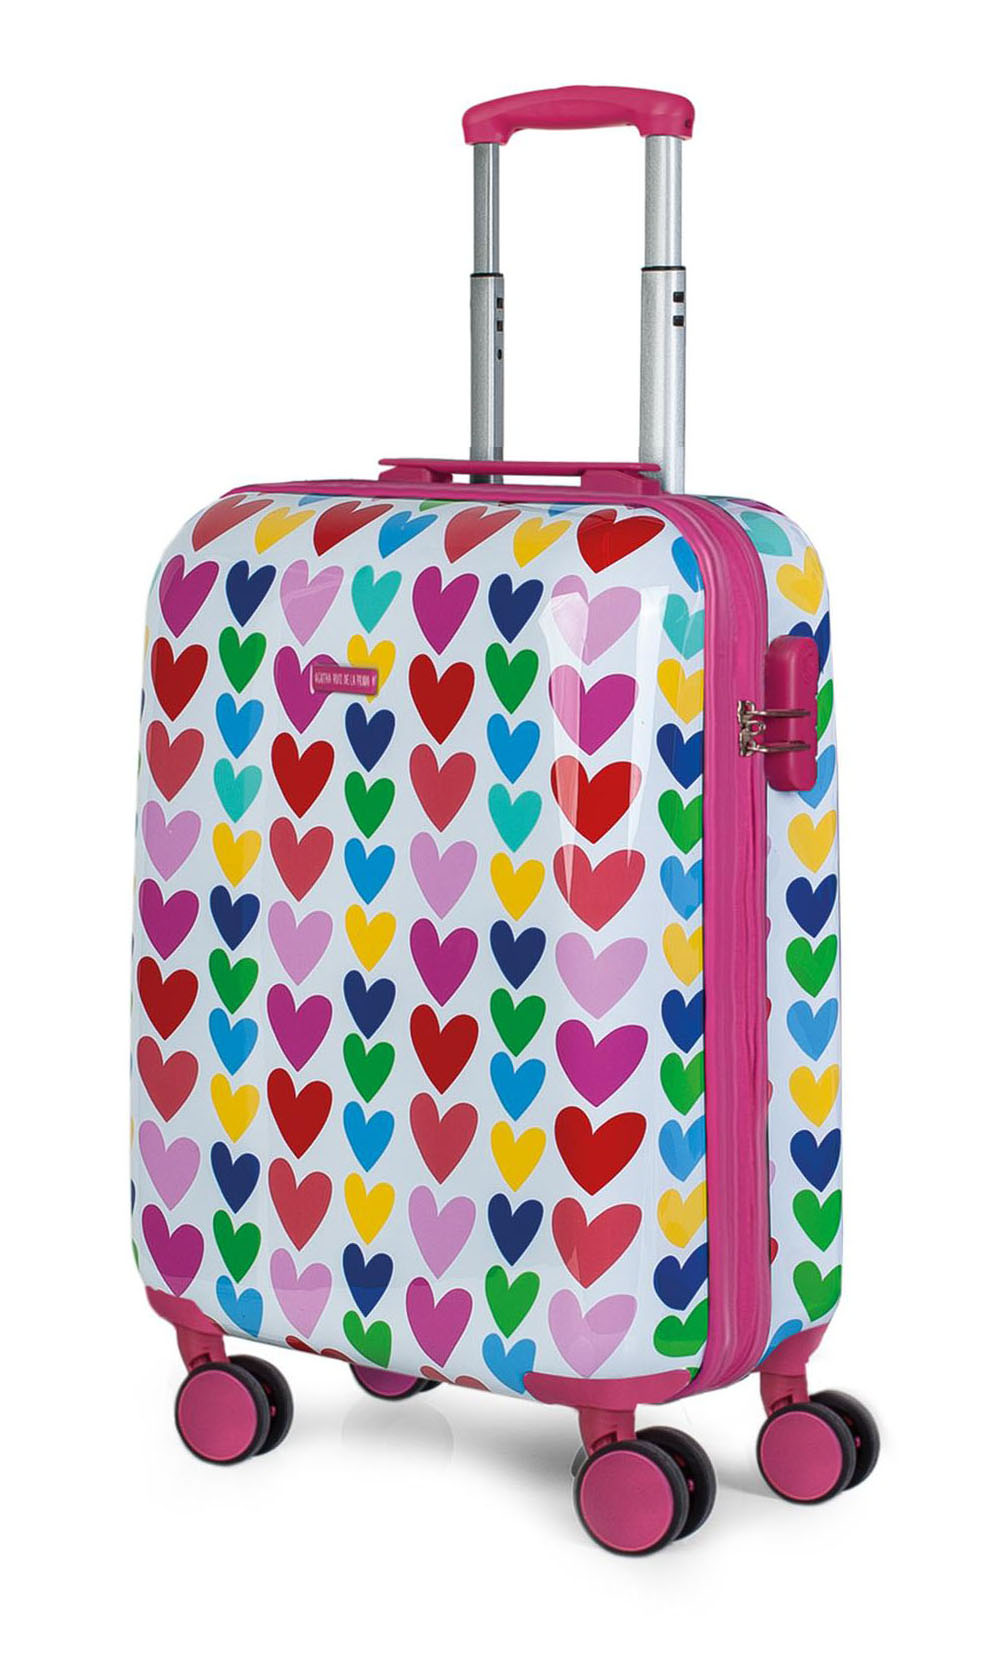 06885448d 130650 maleta de cabina agatha ruiz de la prada corazones vista general